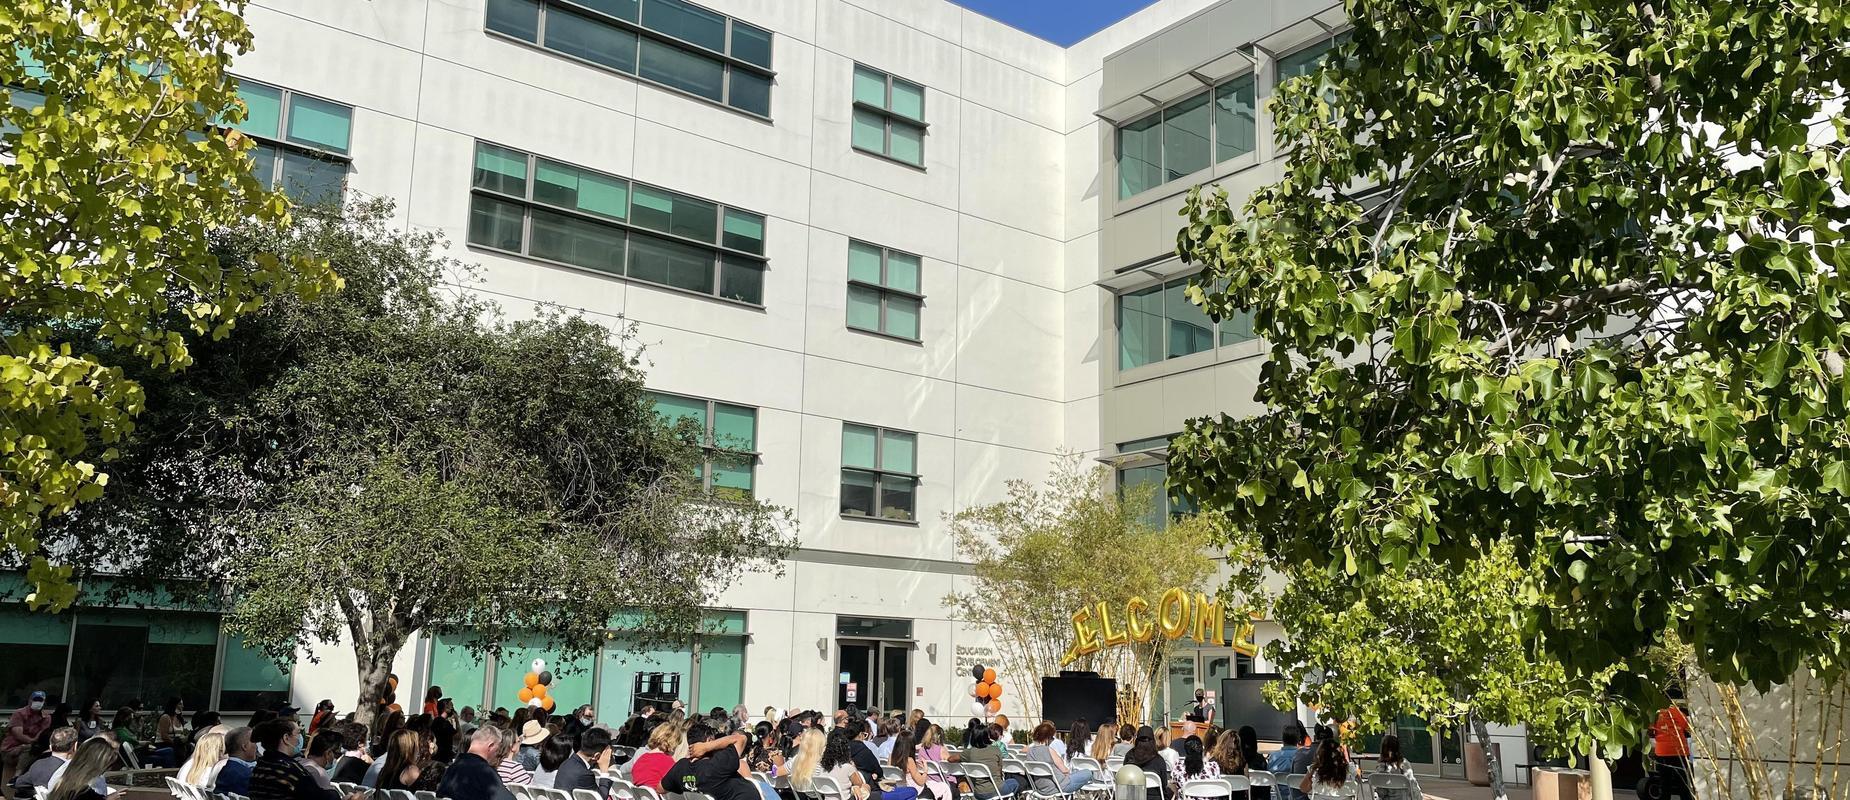 EDC Courtyard